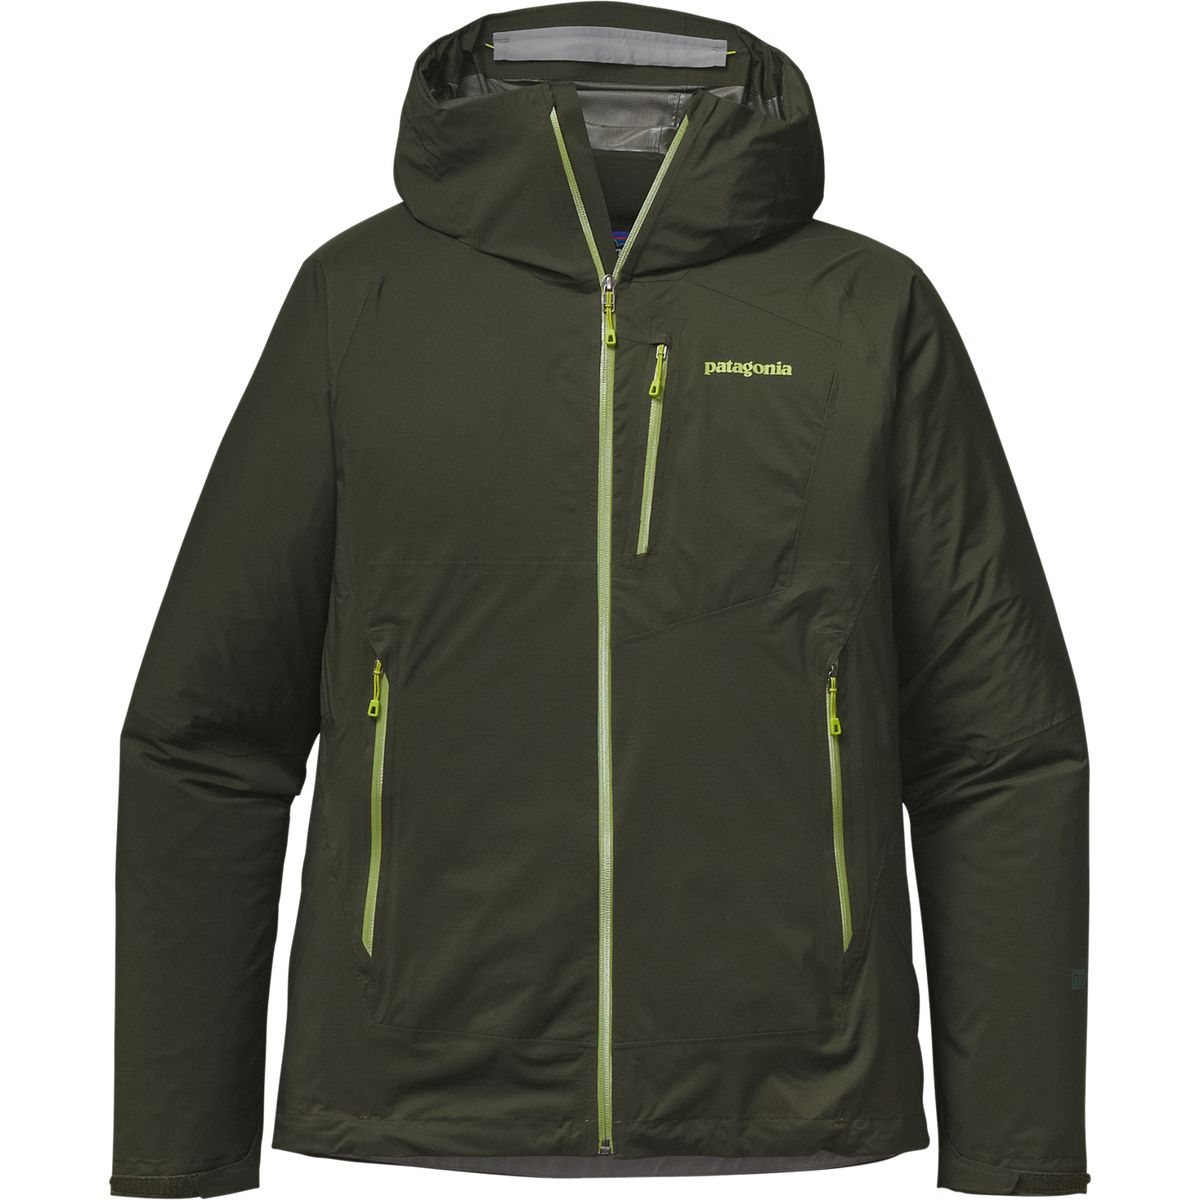 Patagonia Stretch Rainshadow Jacket - Men